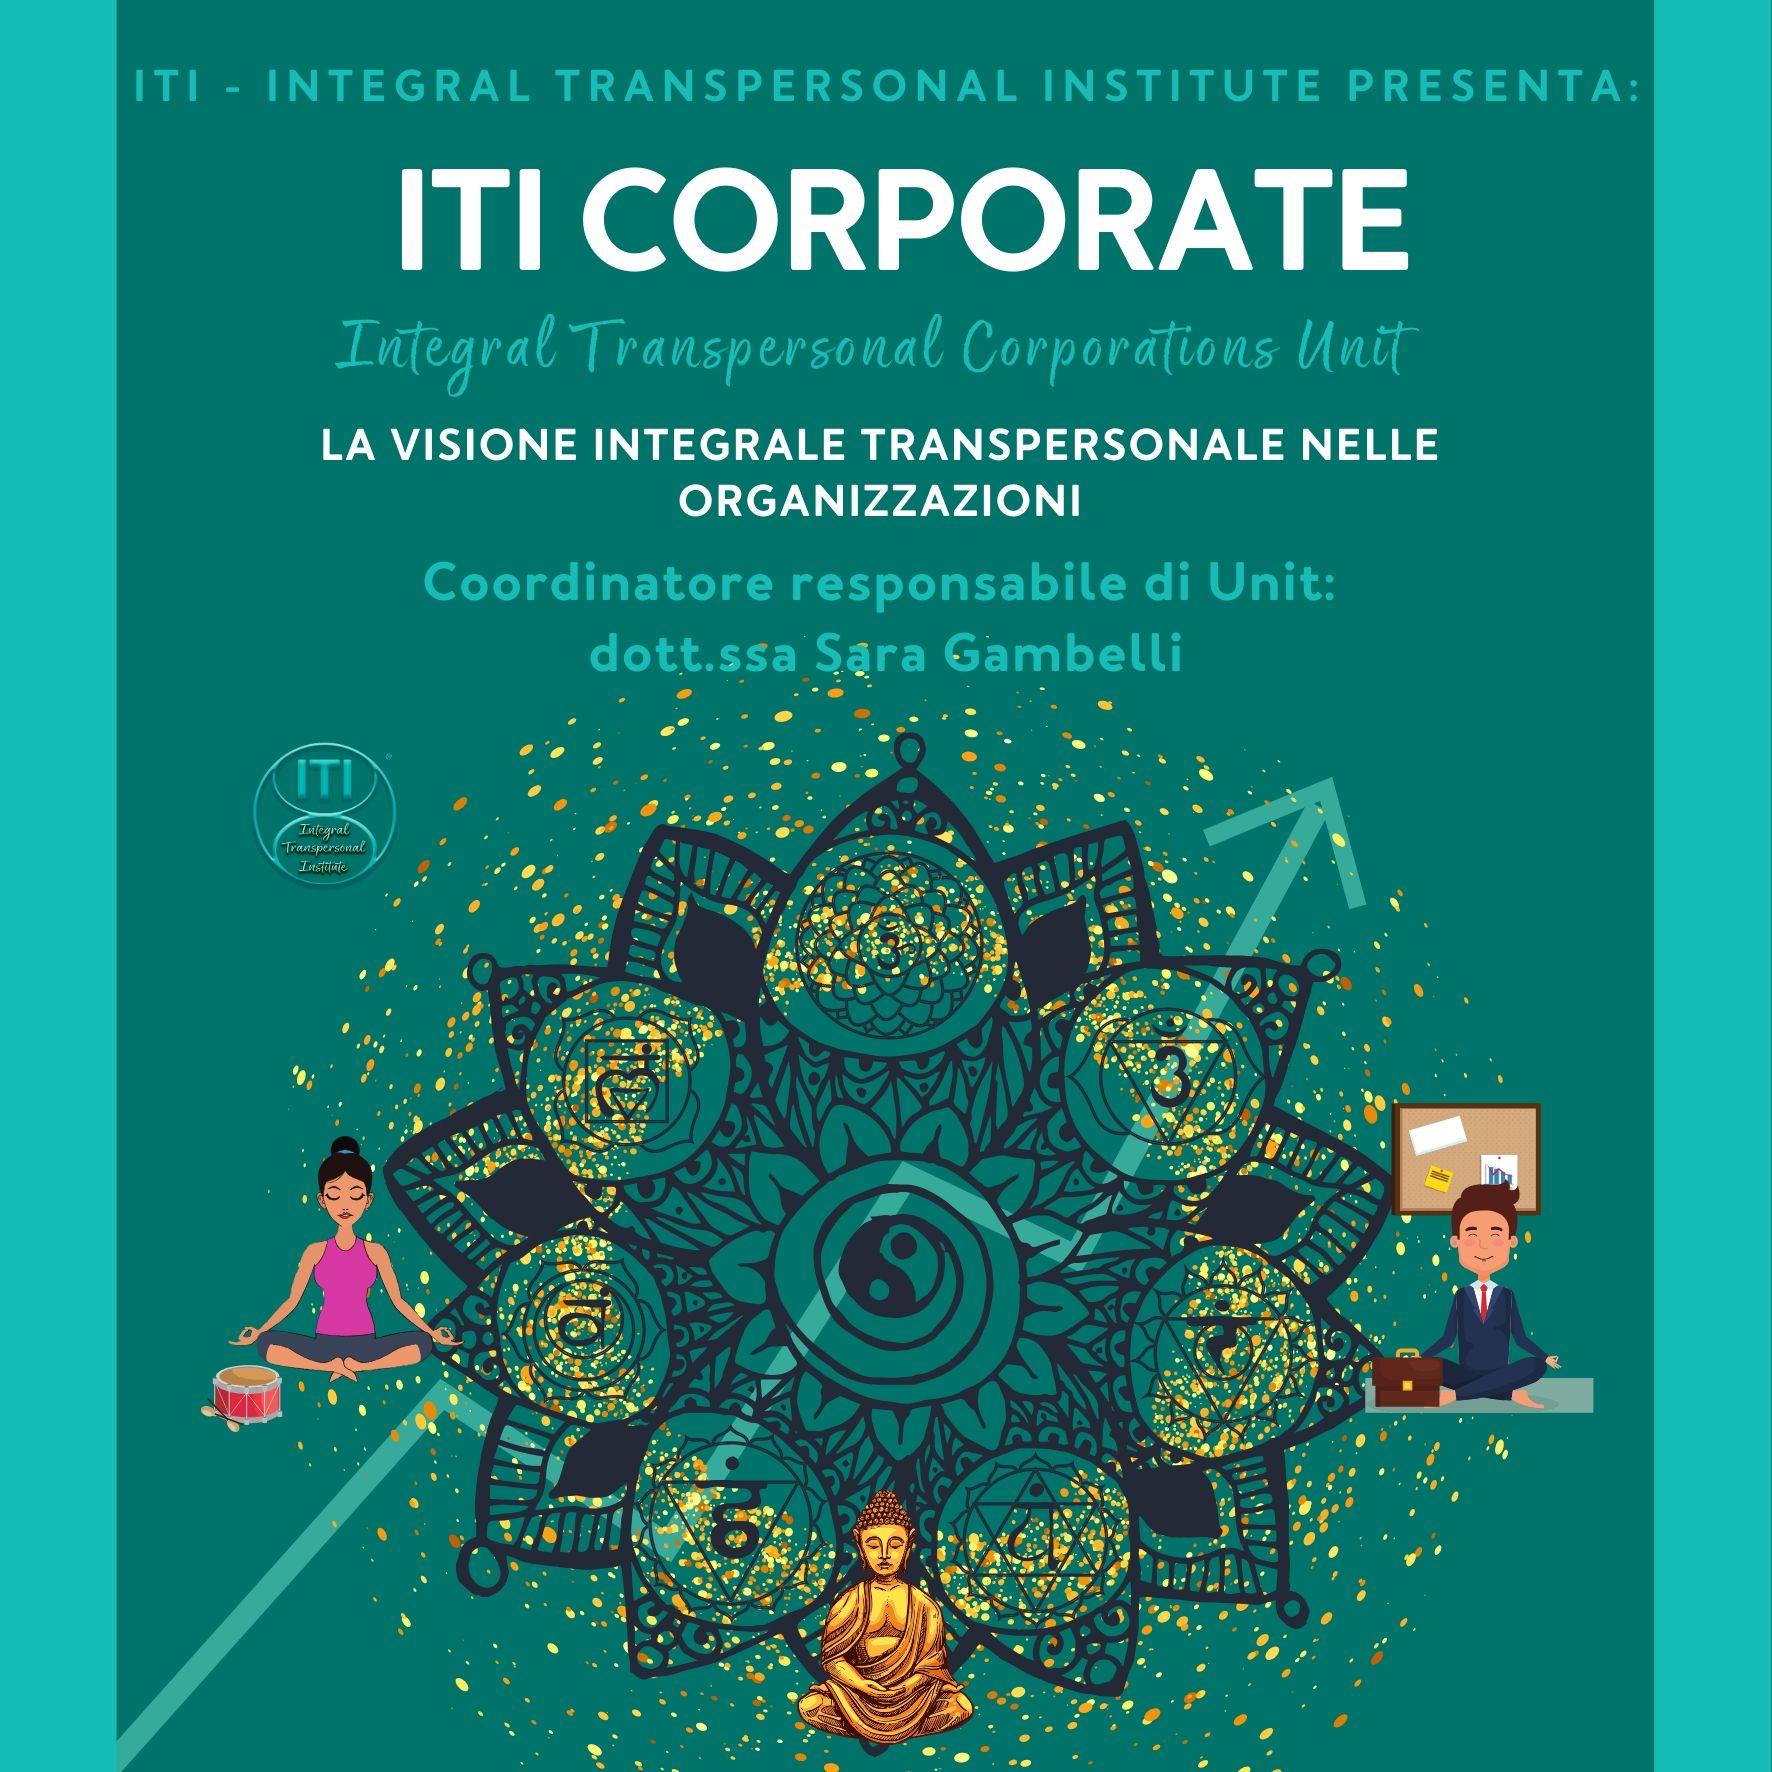 ITI Corporate